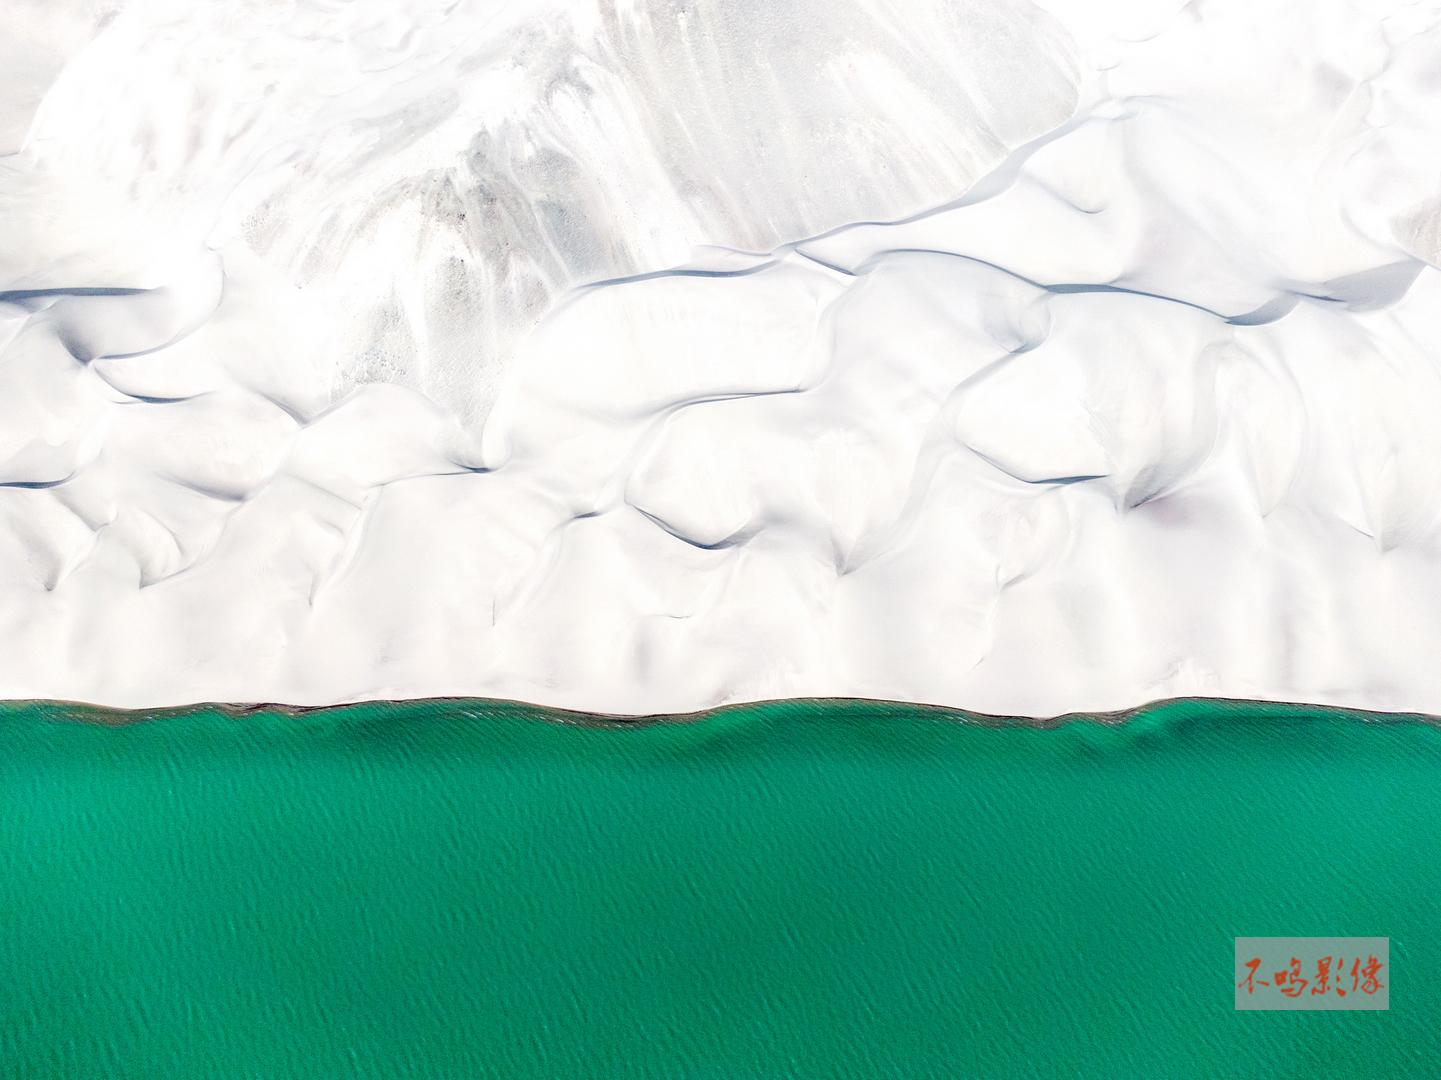 hk_c_40,白沙湖(帕米尔高原的一颗明珠).jpeg